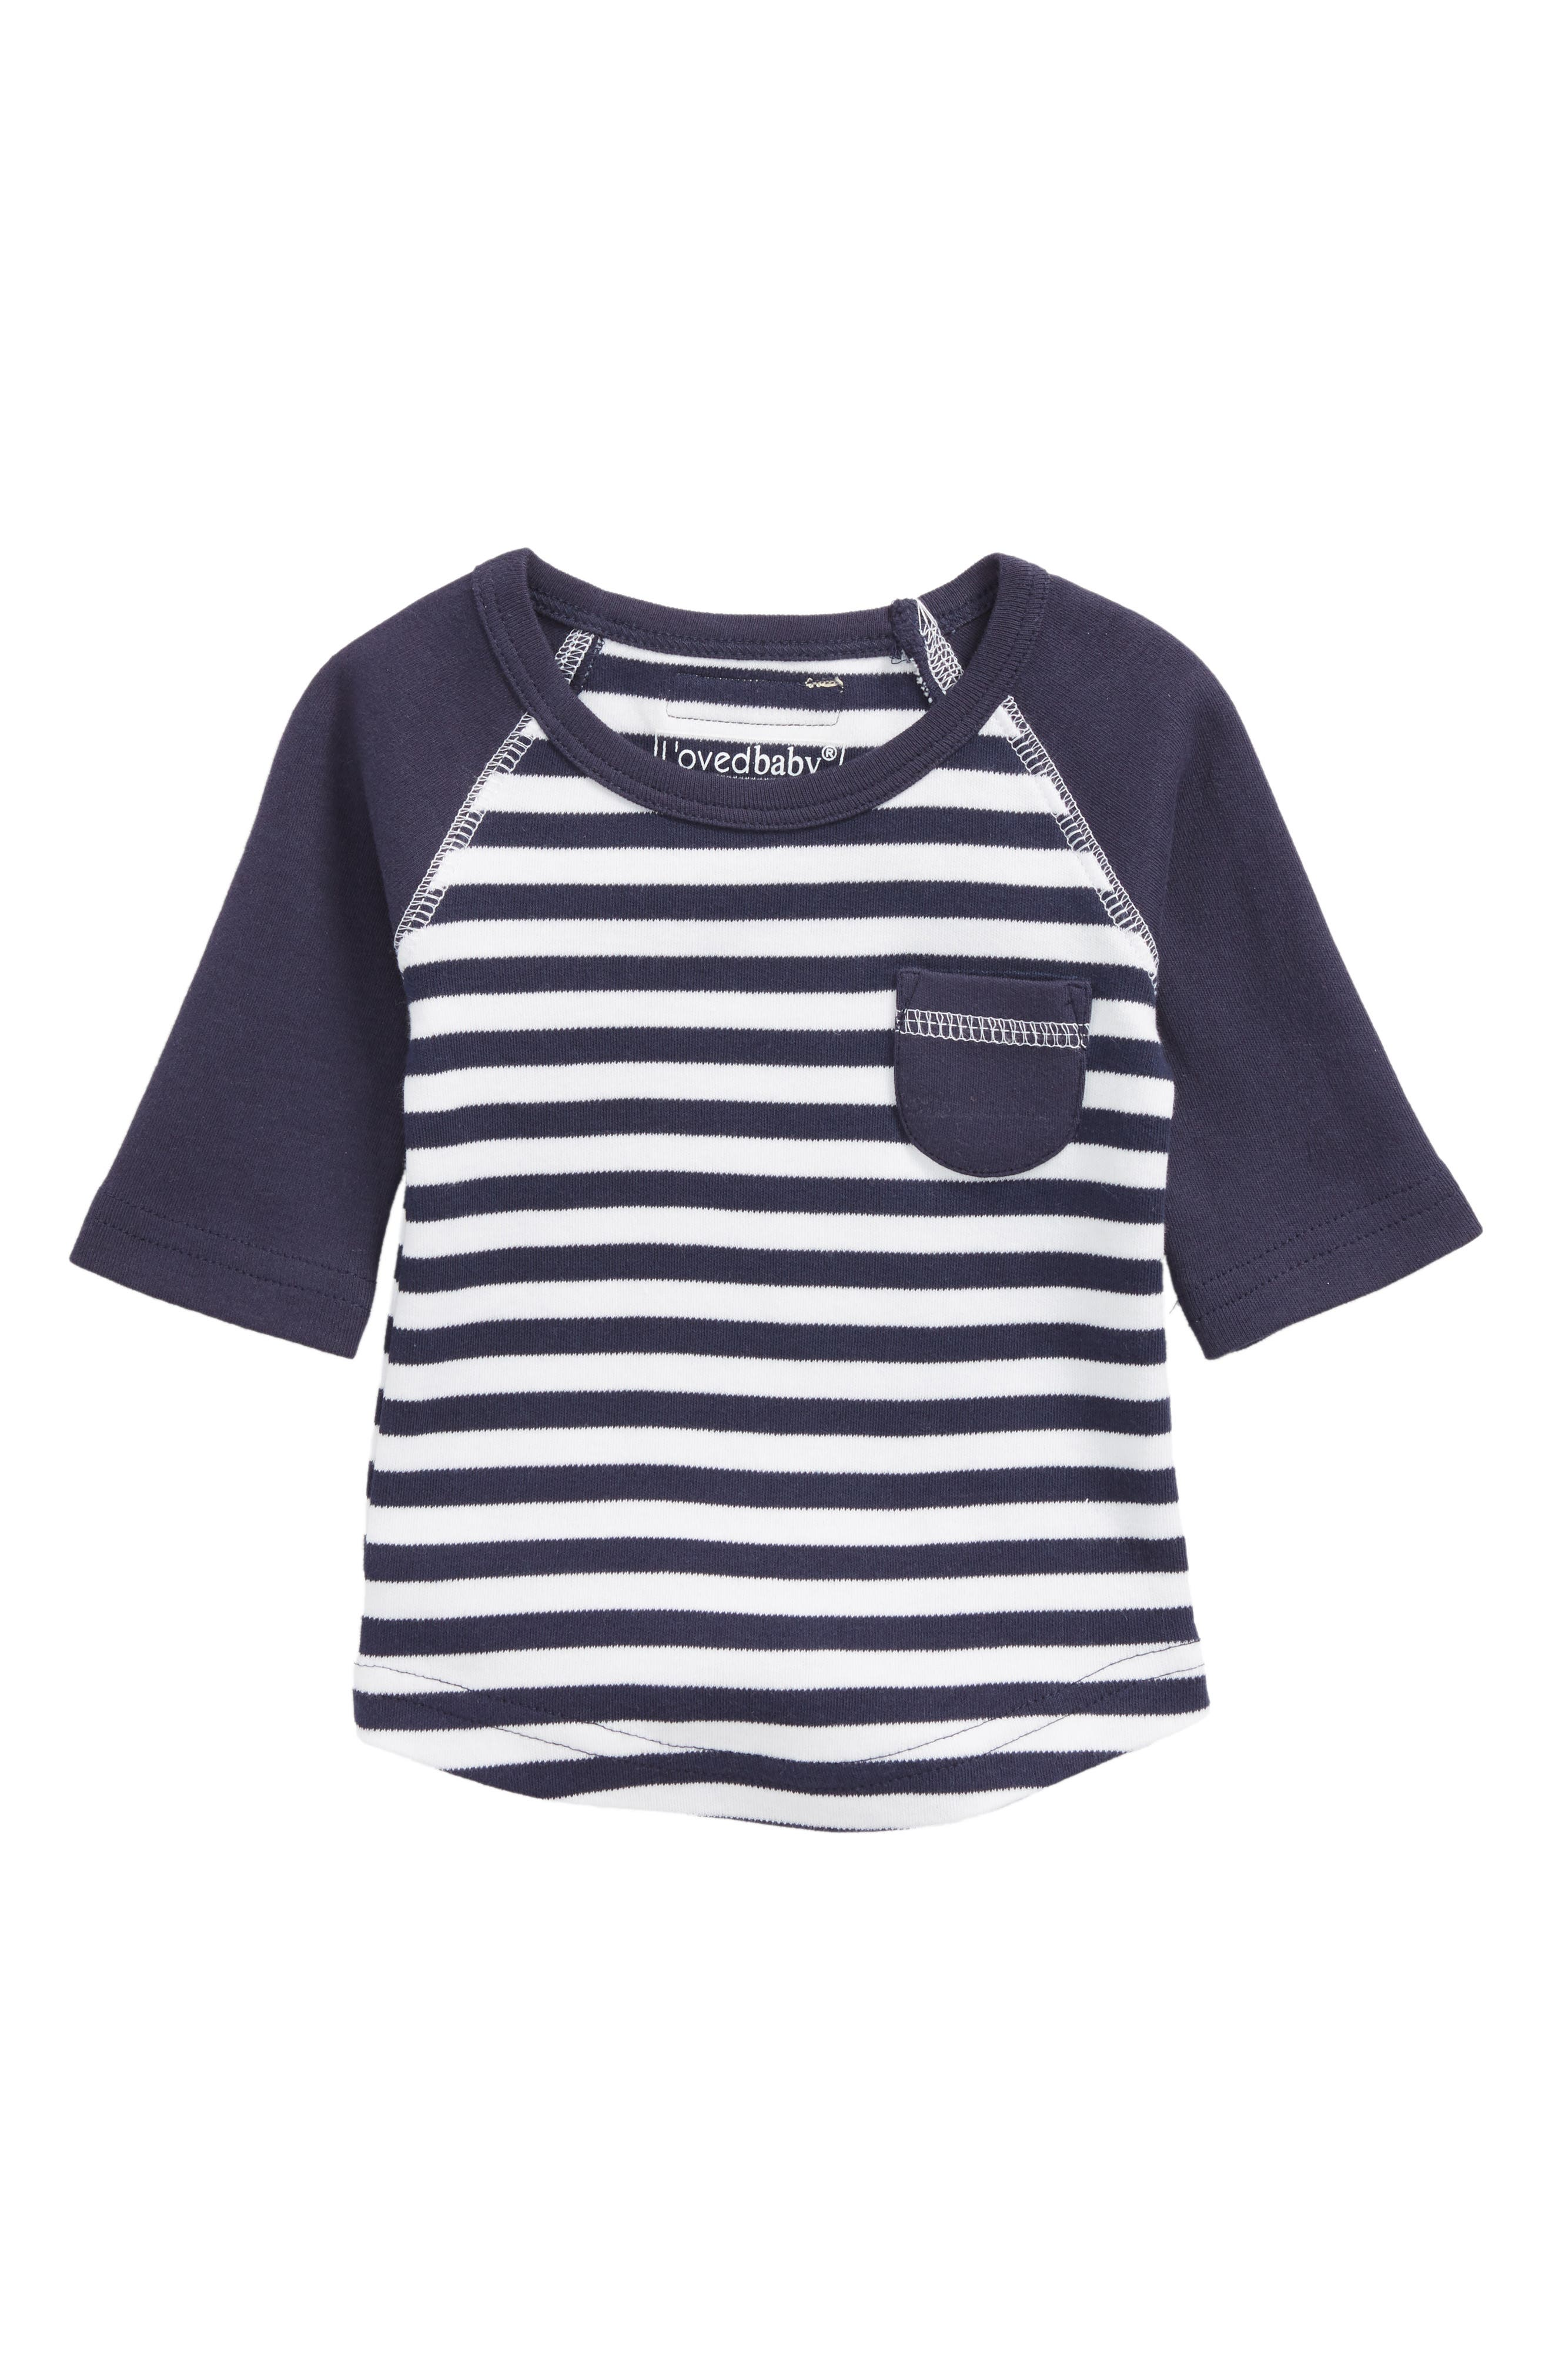 L'ovedbaby Stripe Organic Cotton Raglan T-Shirt (Baby Boys)